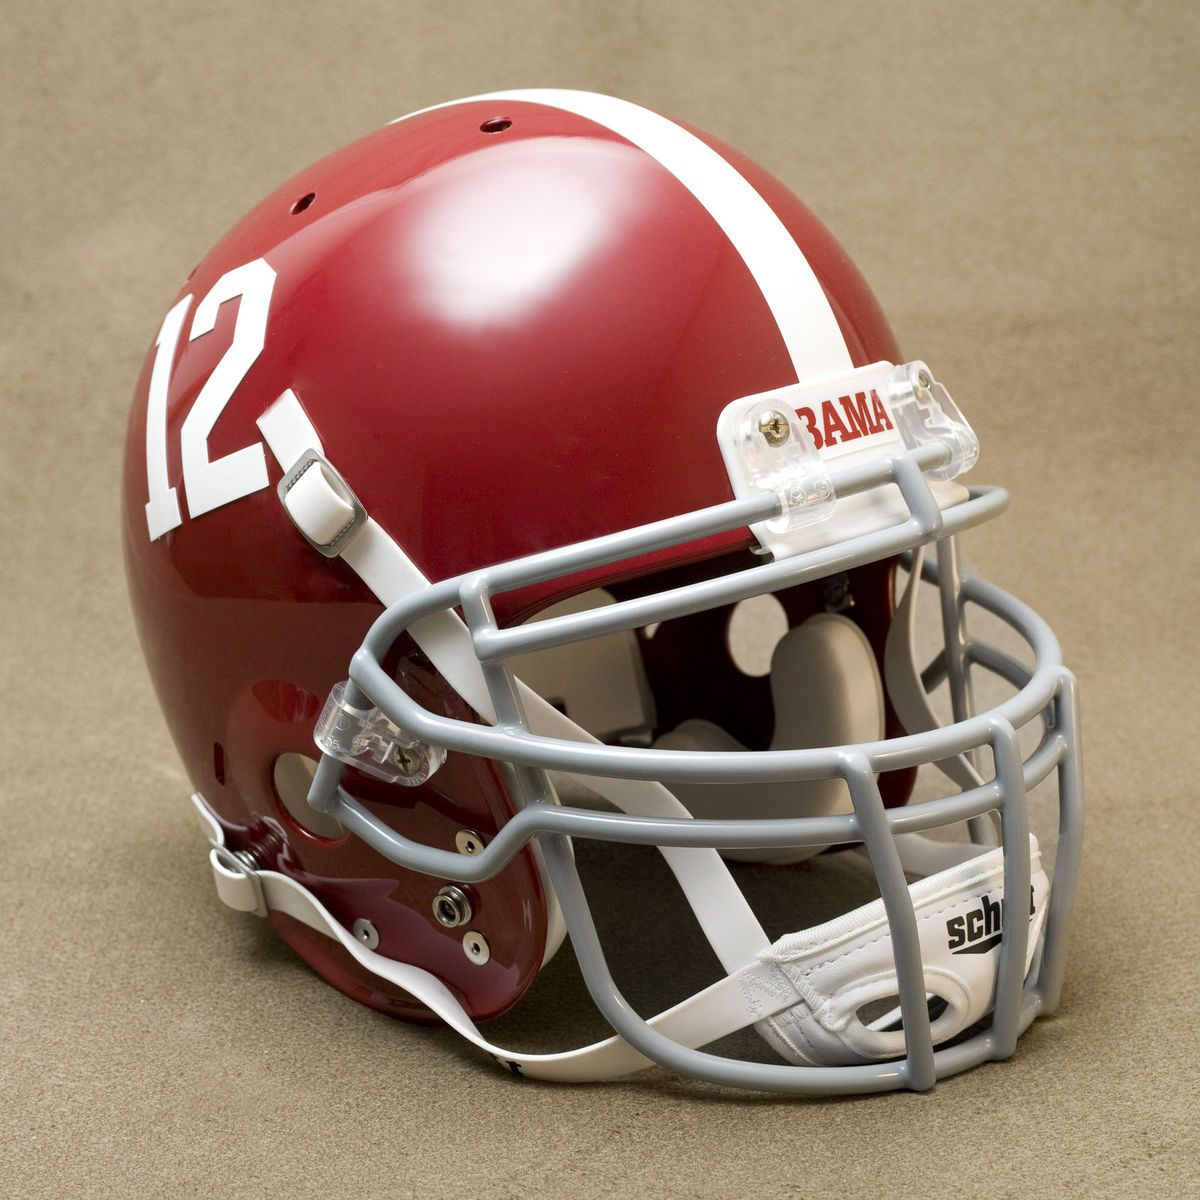 Alabama Crimson Tide Football Helmet 12 Stickers